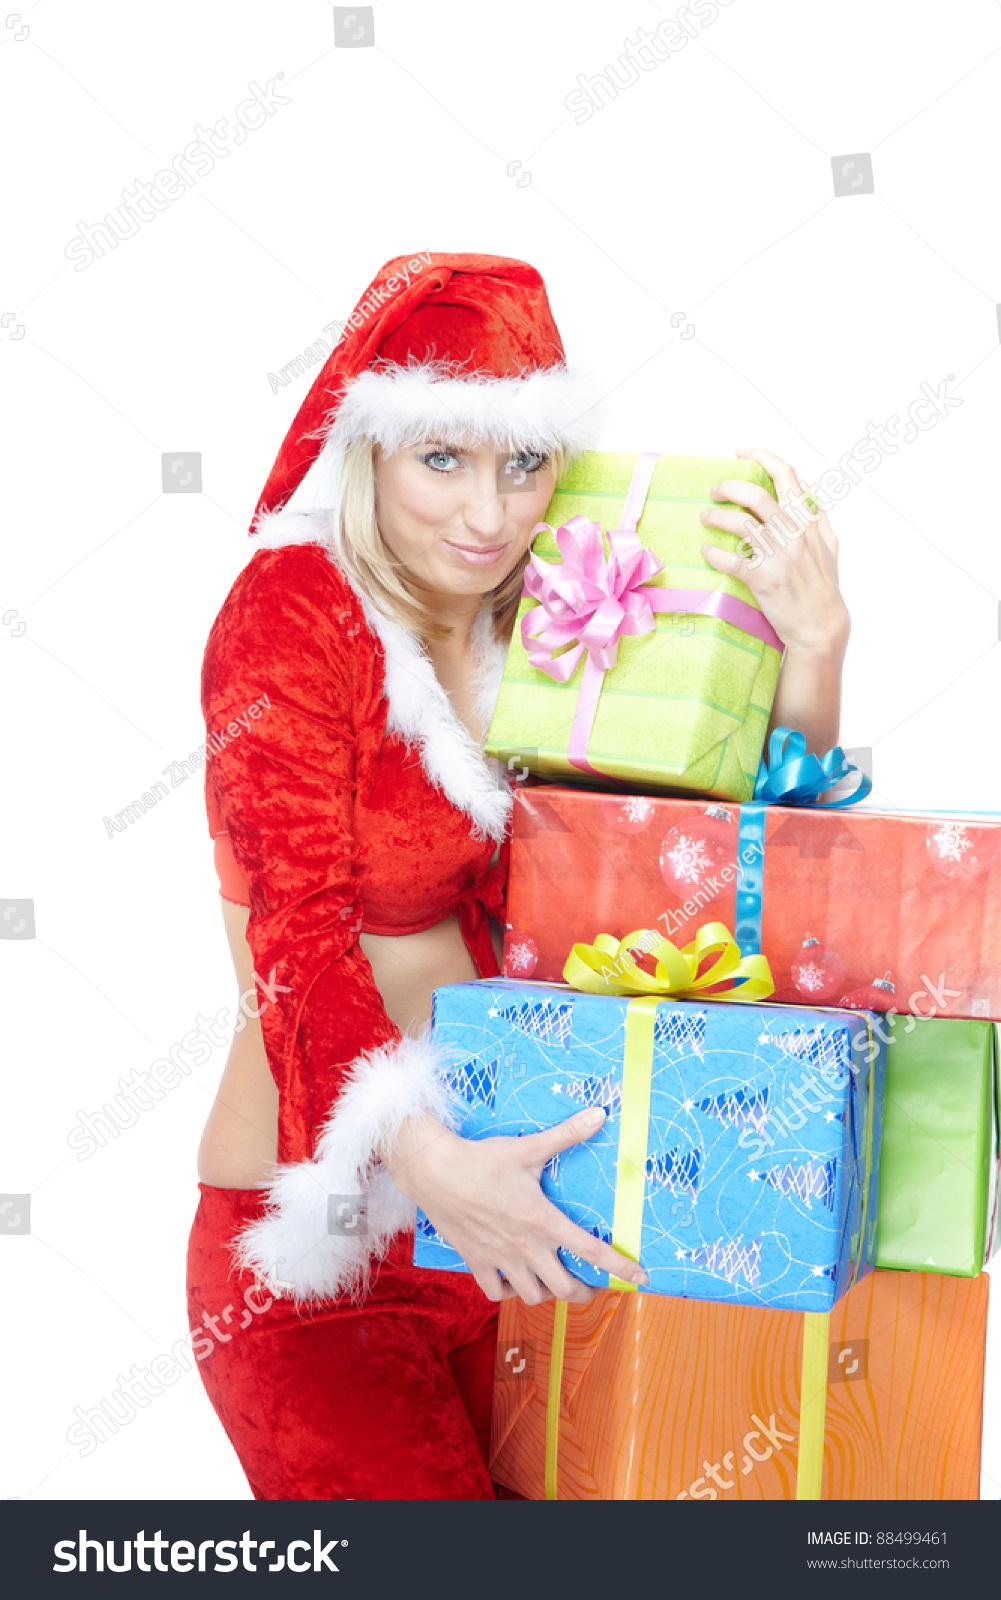 Smiling Lady Santa Claus Costume Christmas Stock Photo (Edit Now ...